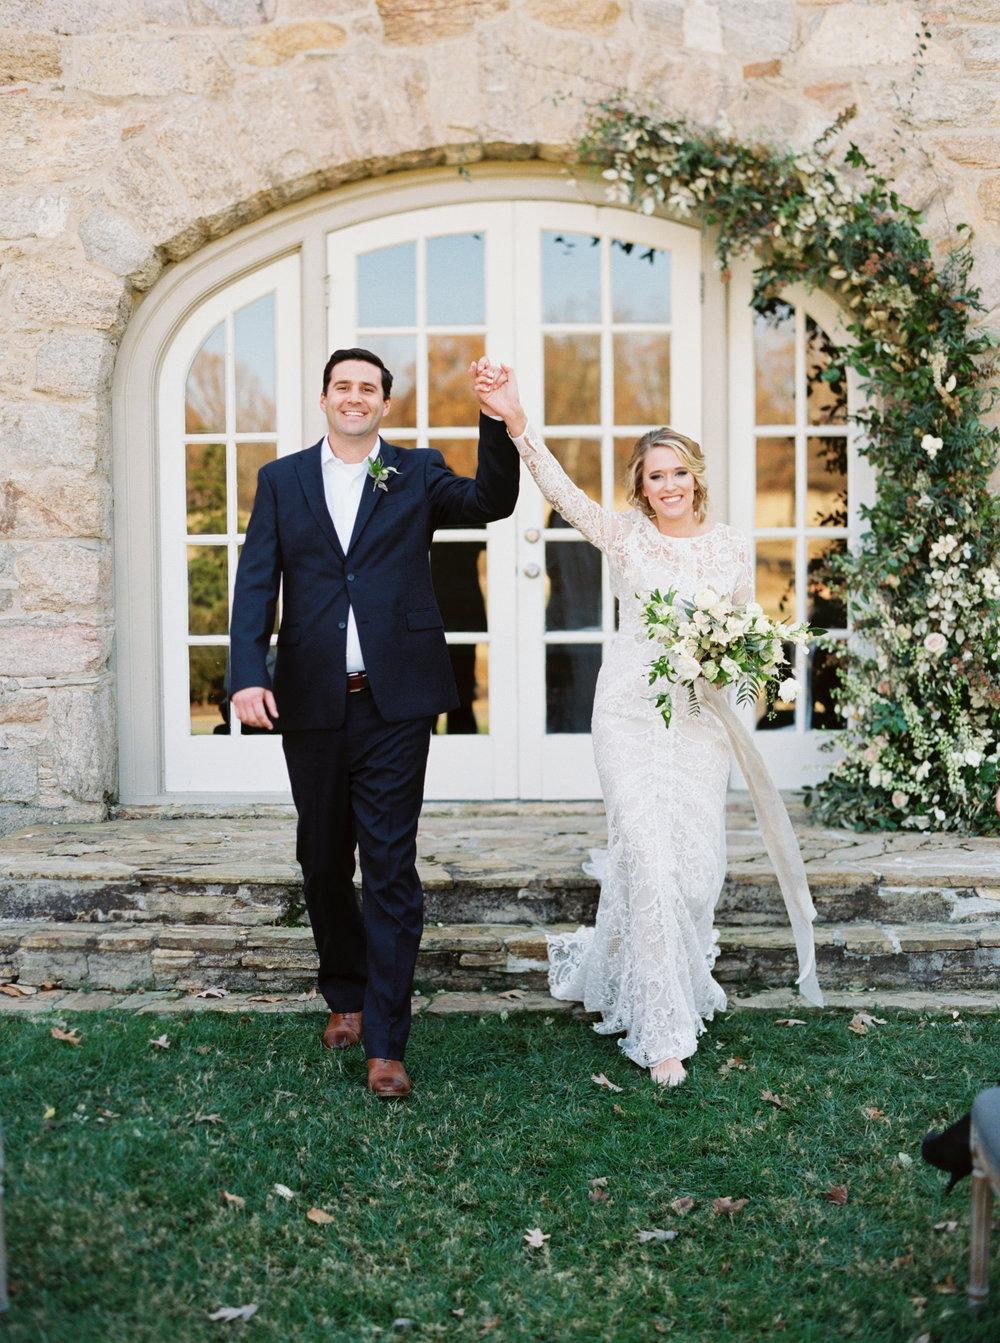 The-Foundry-Weddings-Dec-2016-062.jpg